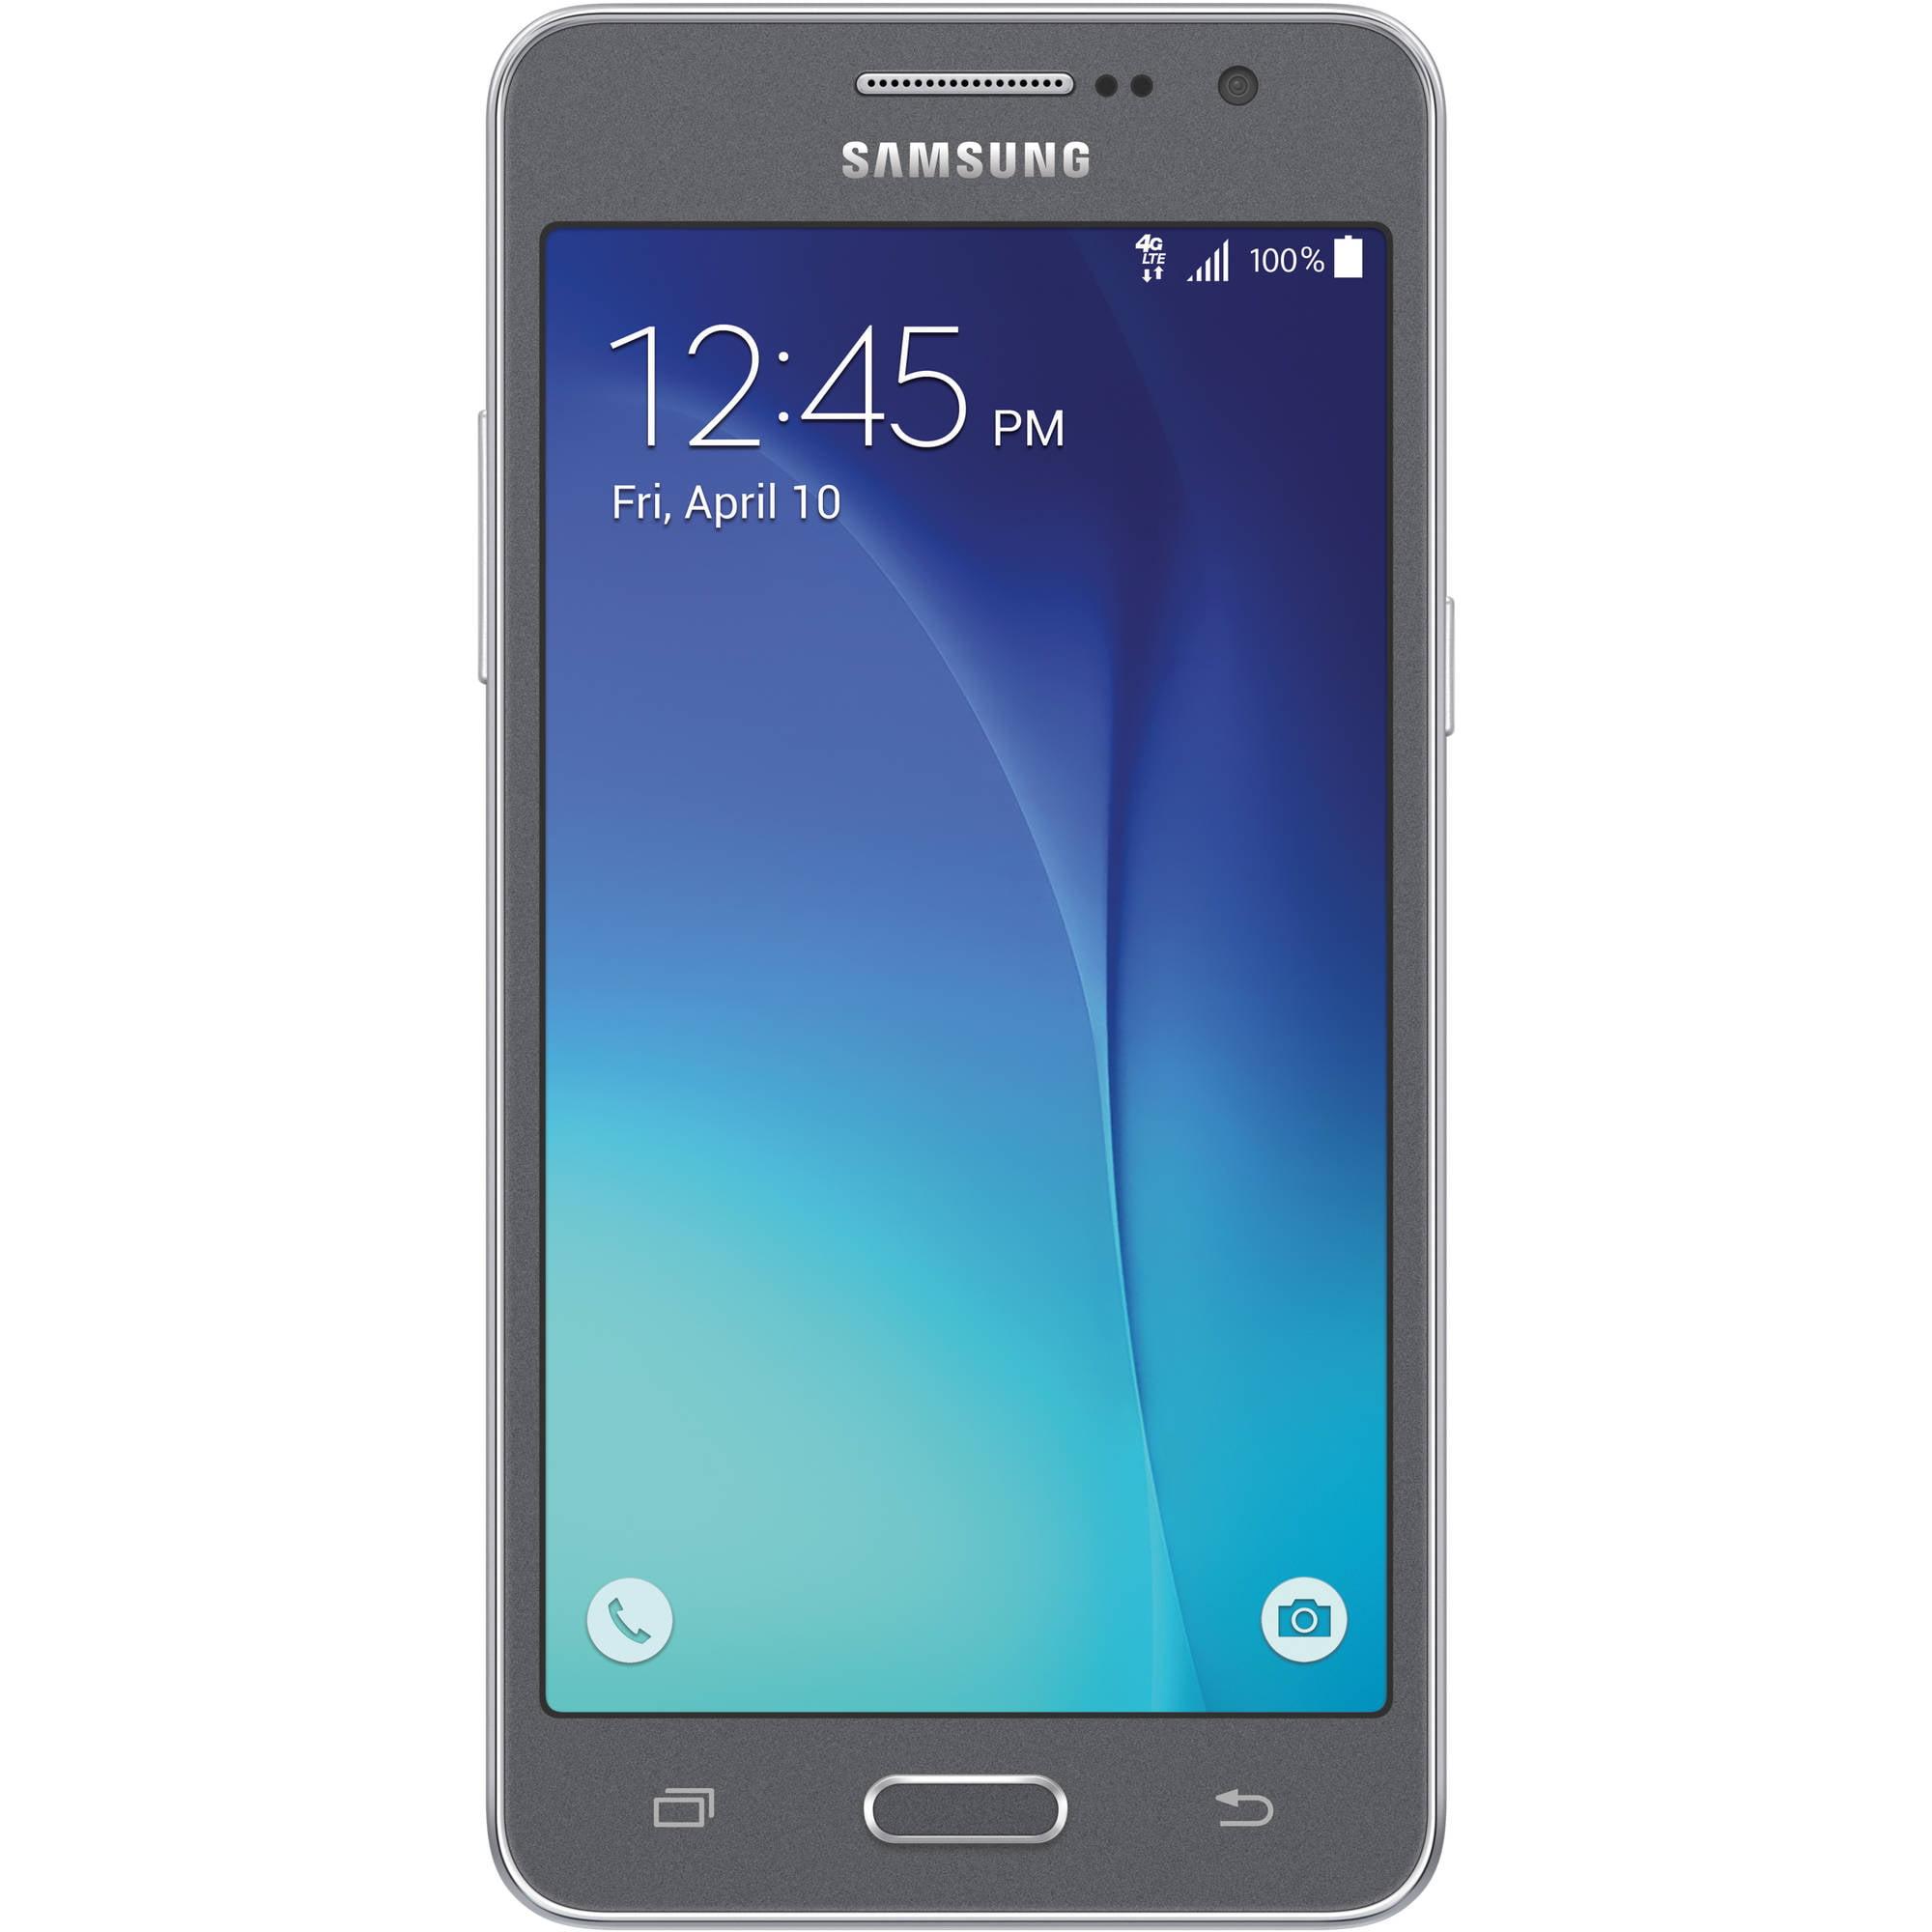 Samsung galaxy grand metallic blue vs white dress